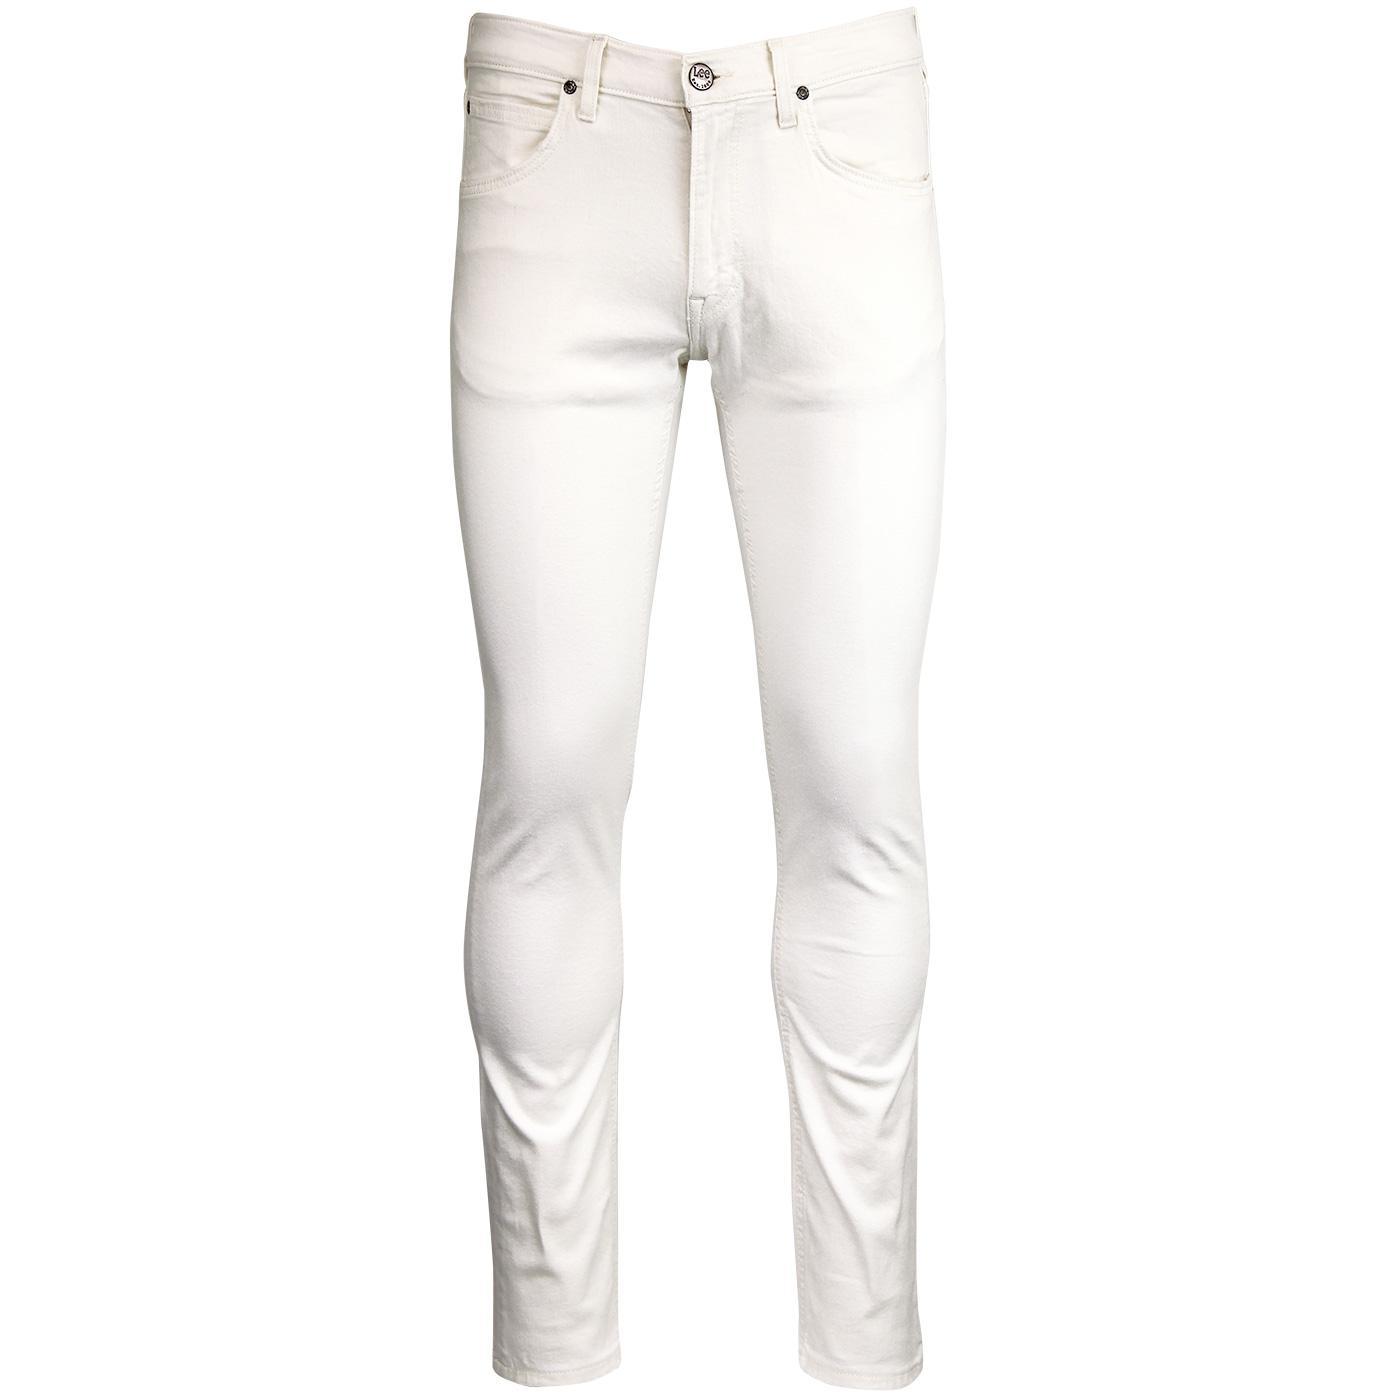 Luke LEE Slim Tapered Retro Mod Denim Jeans White